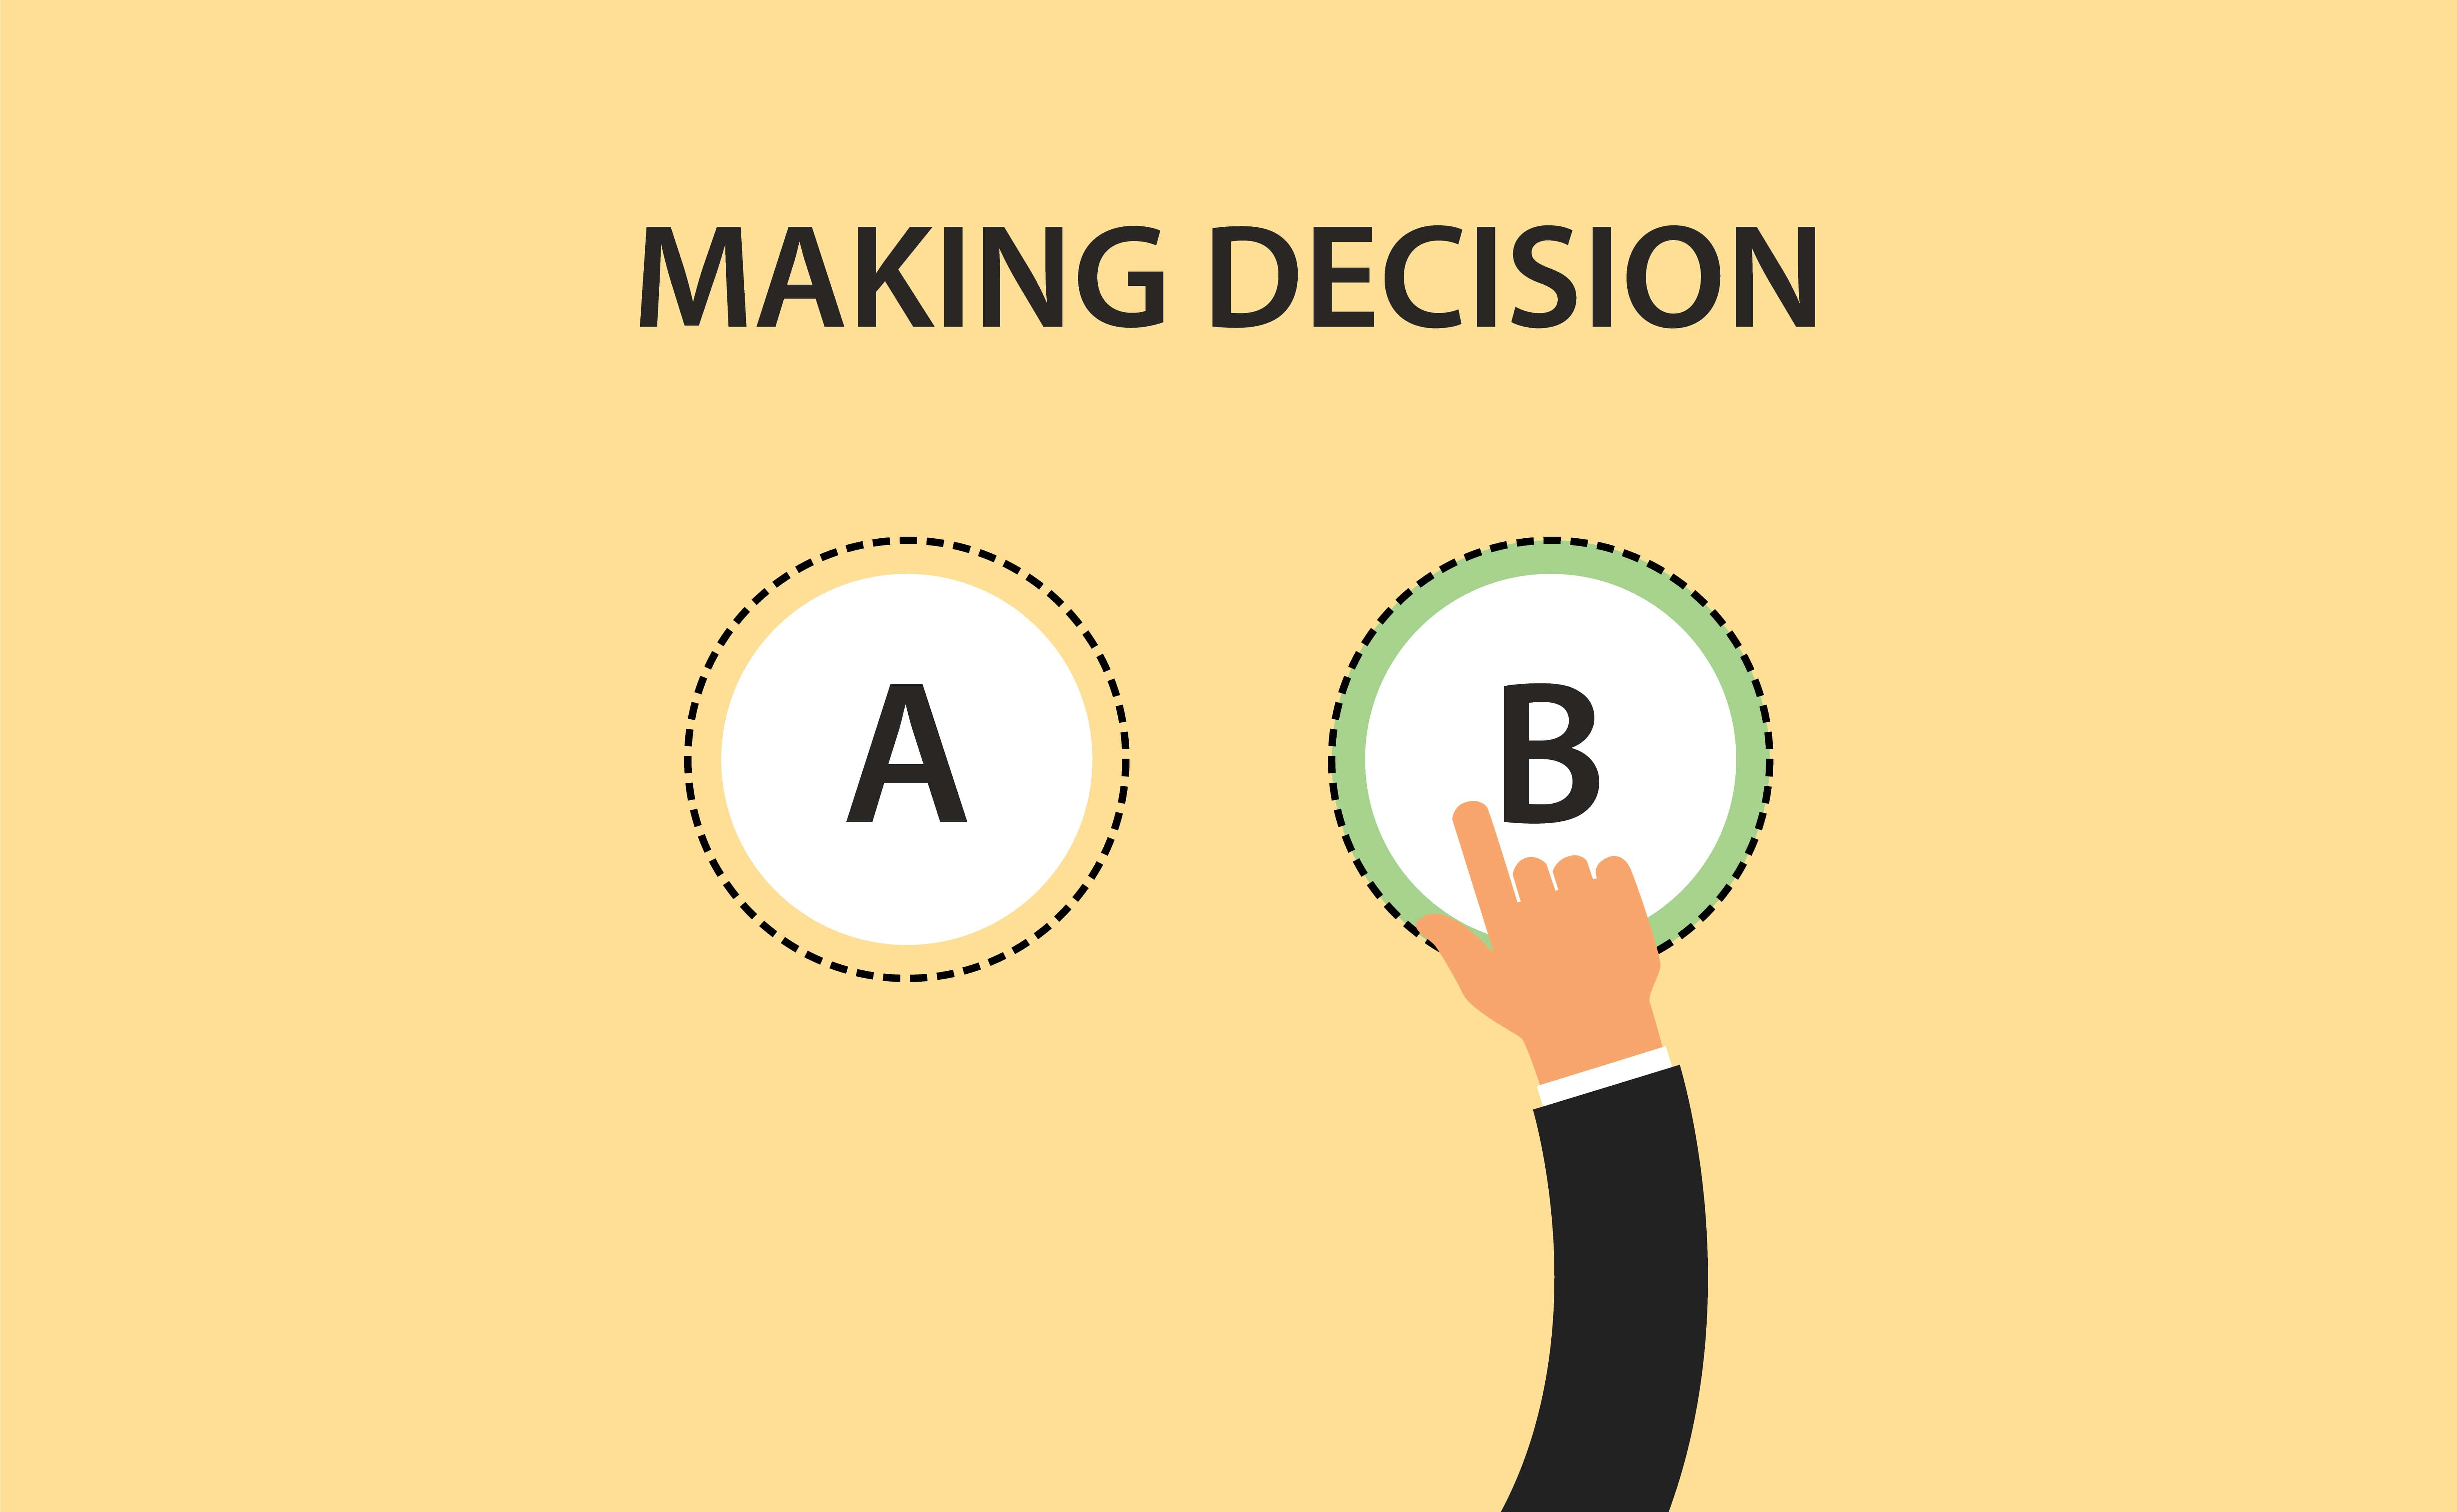 Making tool decision